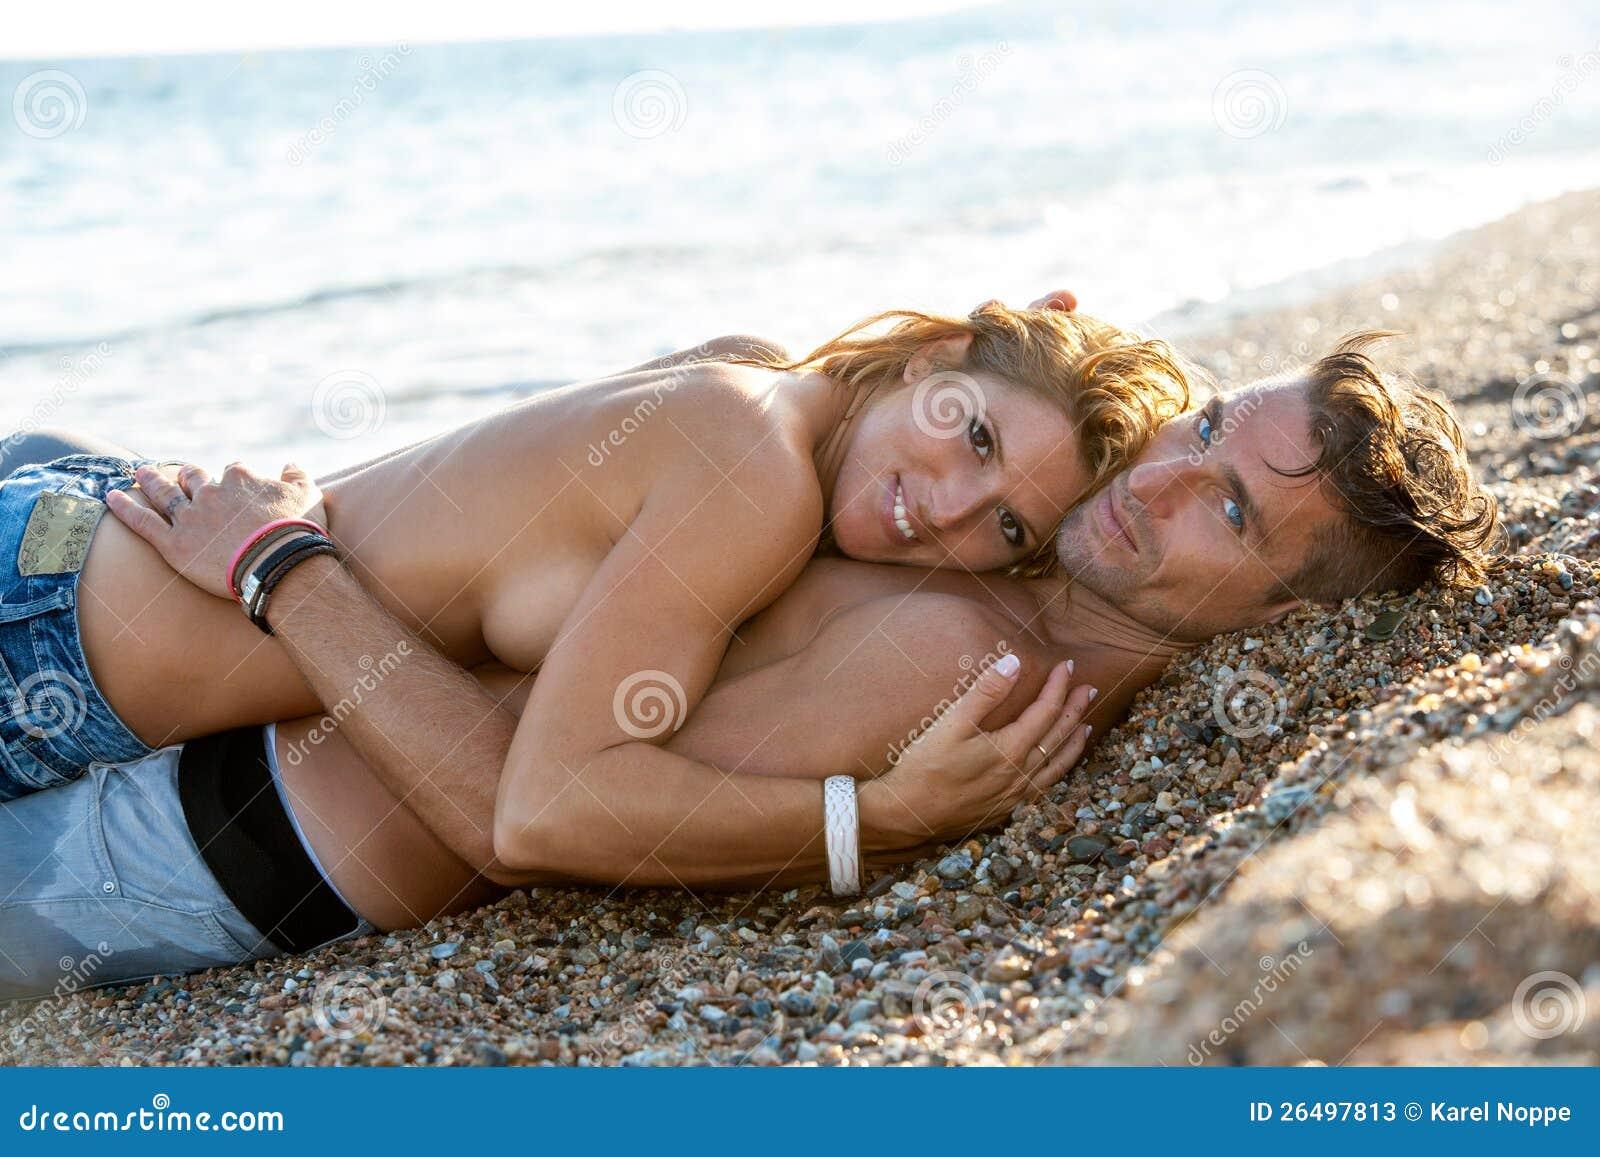 Фото семейной пары на отдыхе секс, Секс на пляже частное фото семейных пар 19 фотография